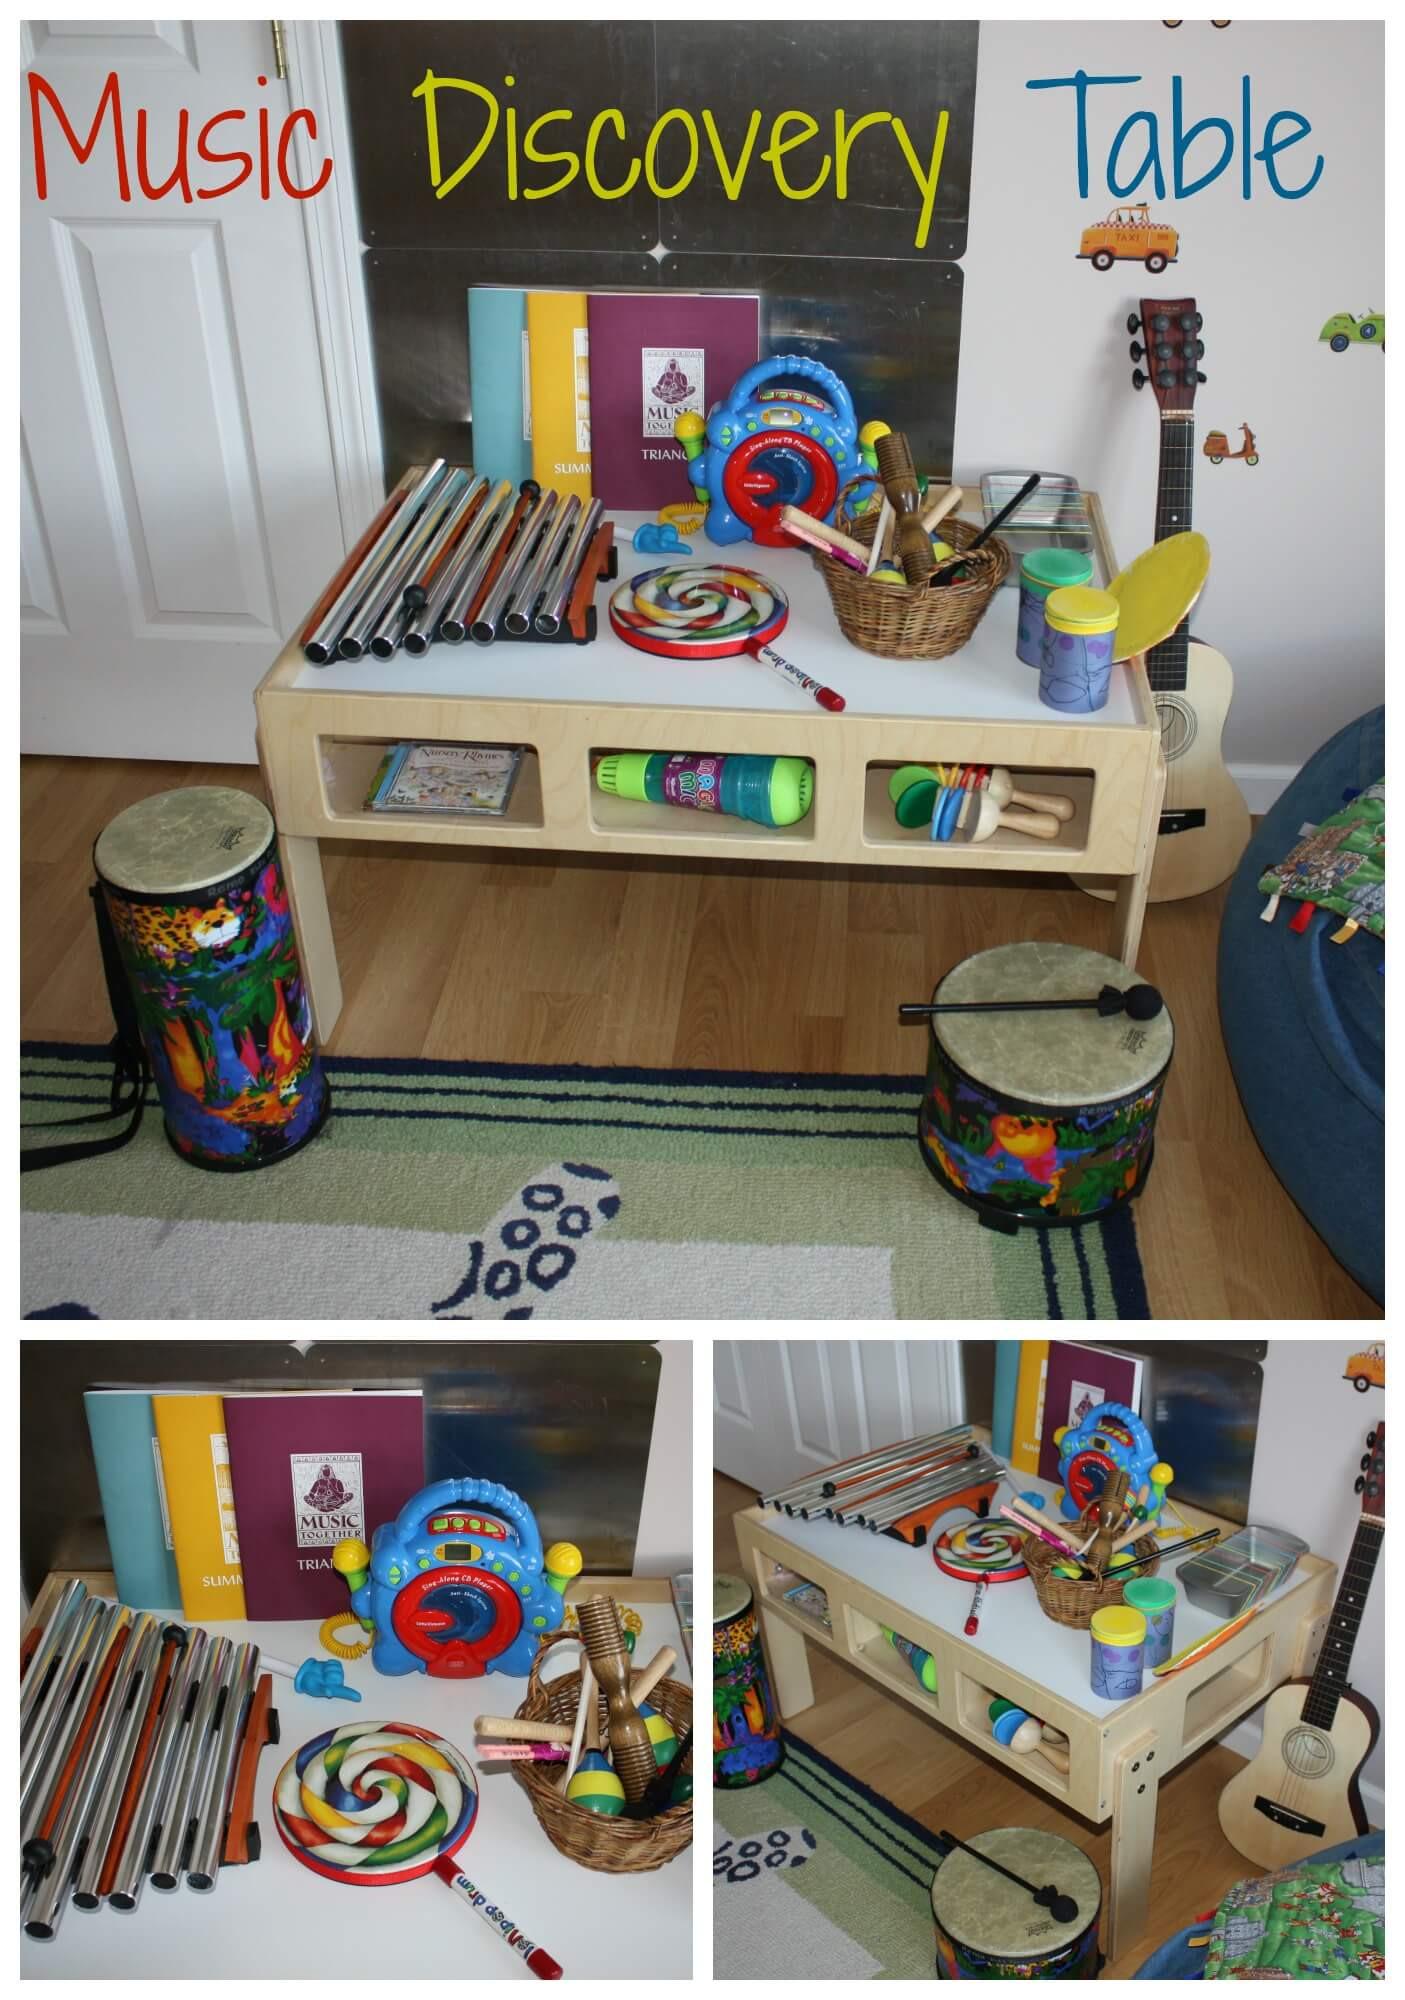 Preschool Projects Ideas  25 Playful Learning Preschool Activities